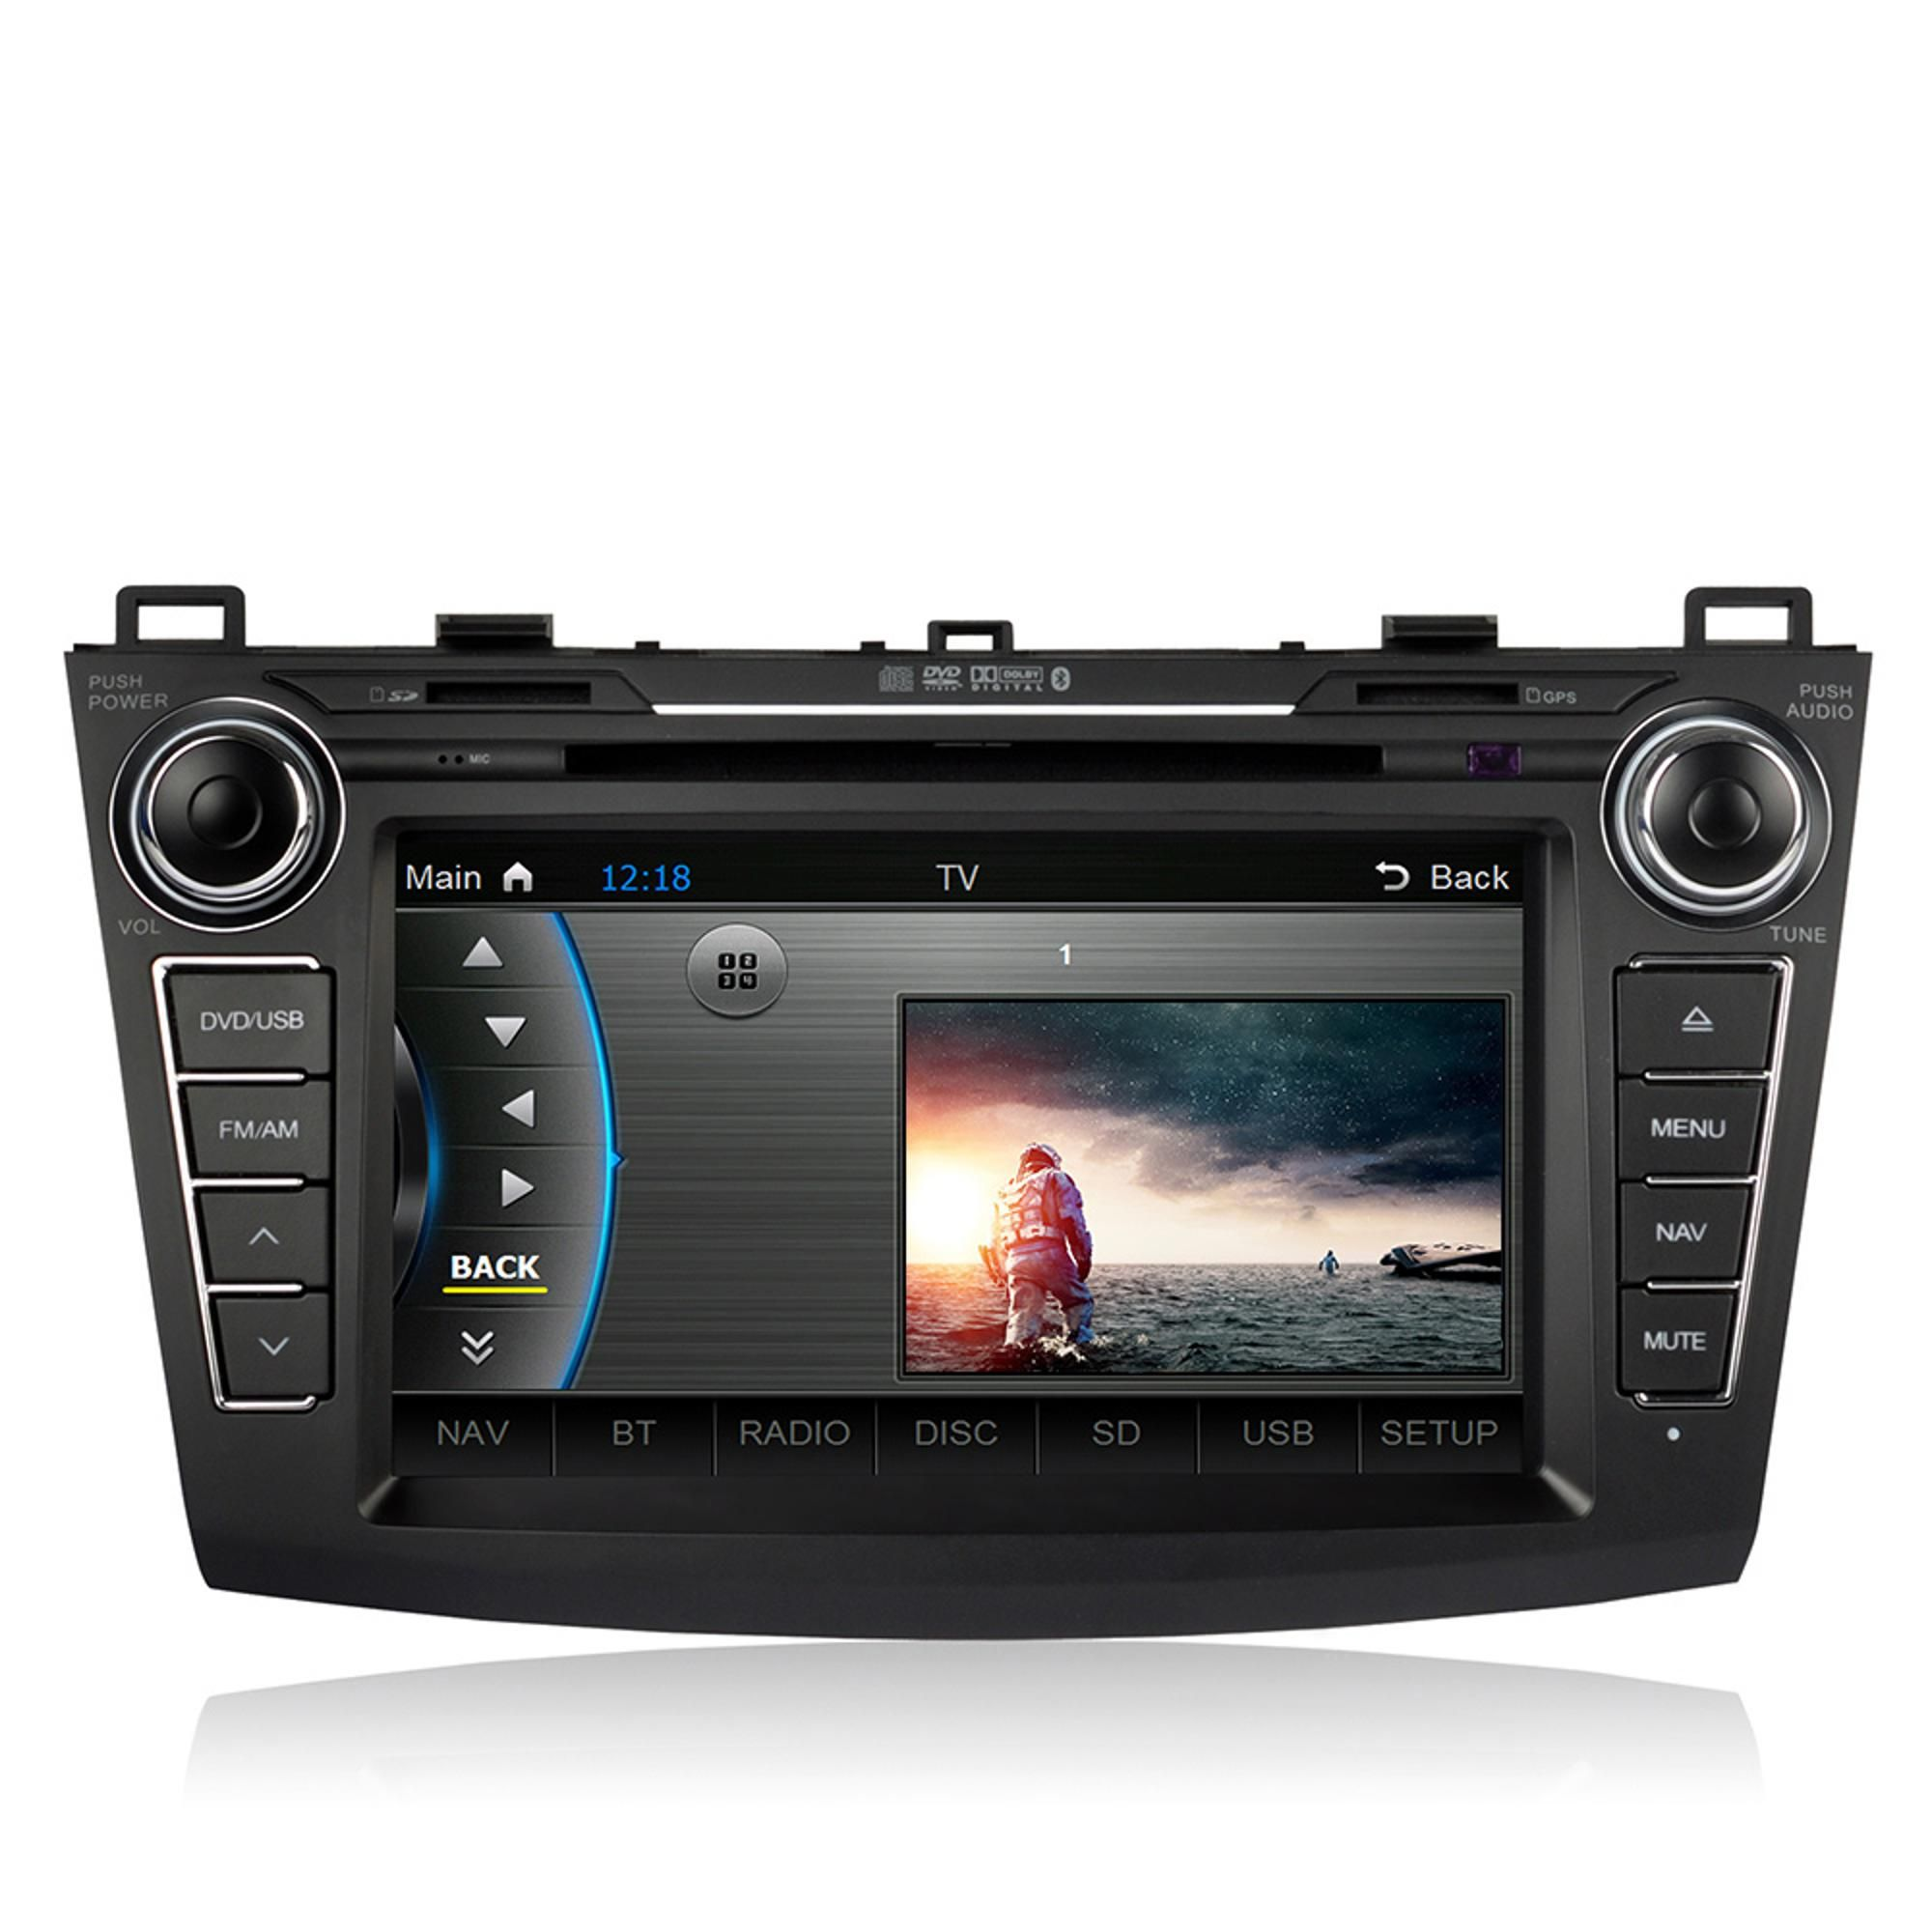 Caska 8 inch hd touch screen car in dash dvd player 2 din car pc